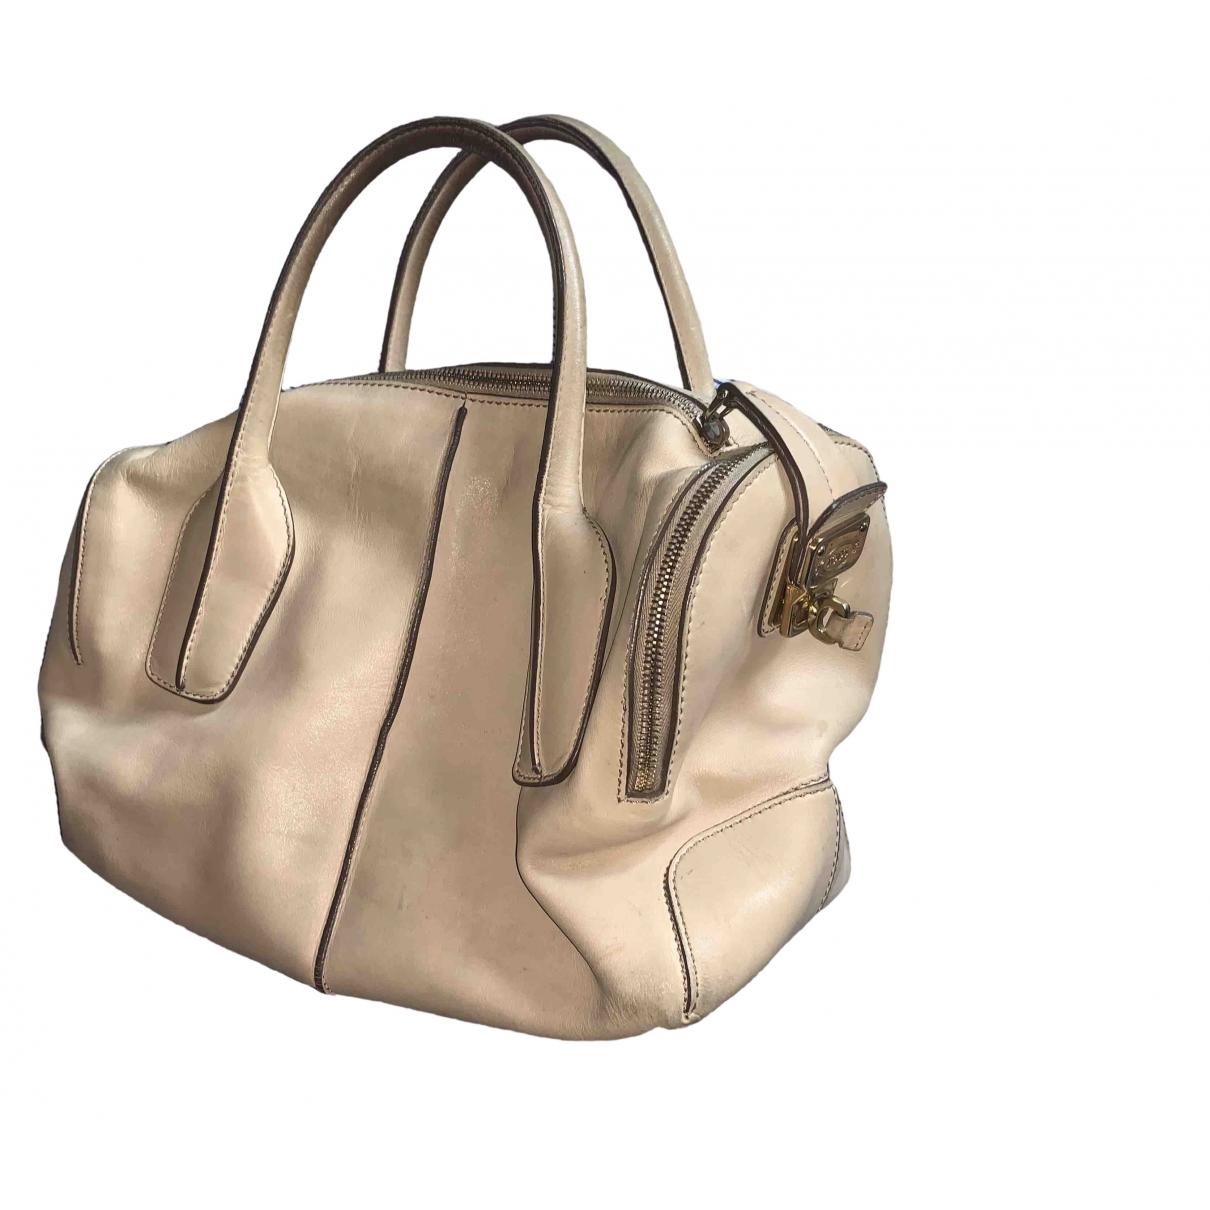 Tod's \N Handtasche in  Beige Leder